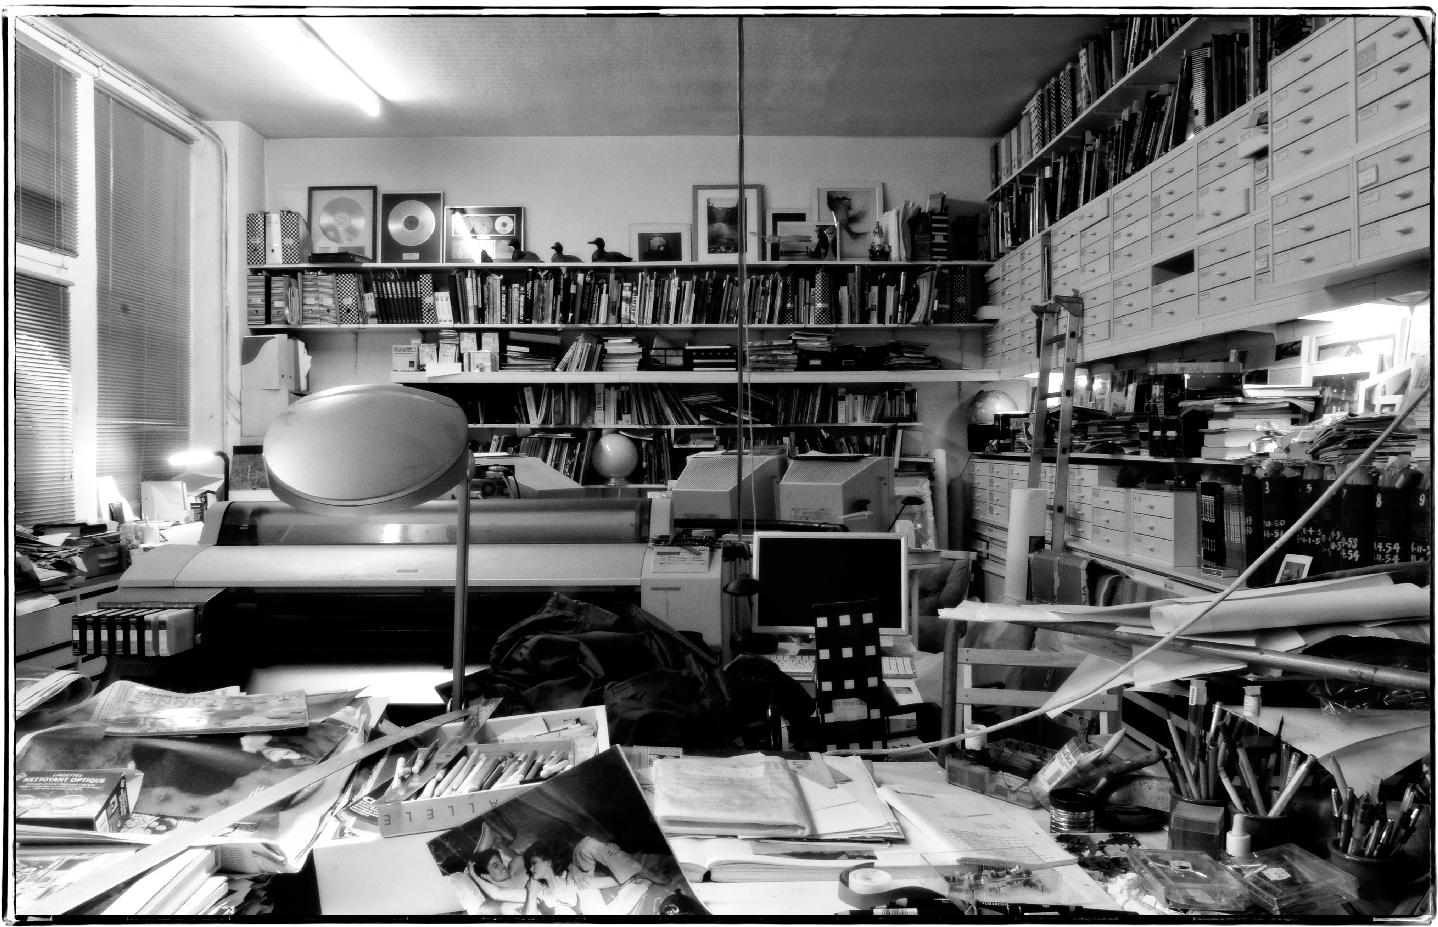 Guy Peellaert's Paris studio on rue de Charonne, photographed by Christian Sarramon,December 2008.